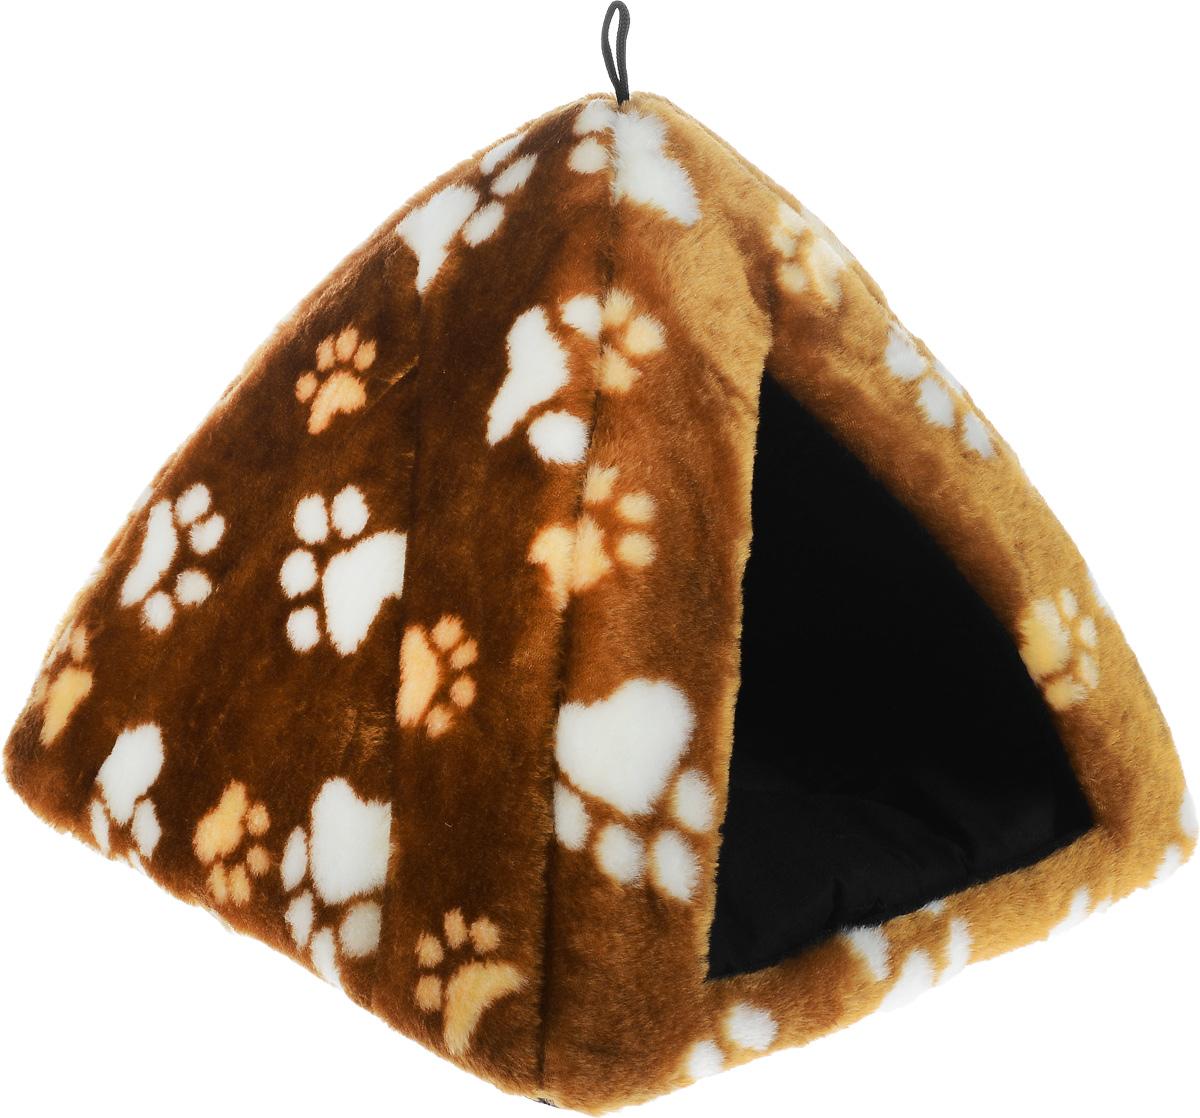 "Домик для животных Elite Valley ""Вигвам"", цвет: светло-коричневый, бежевый, белый 35 х 35 х 32 см. Л-22/1"